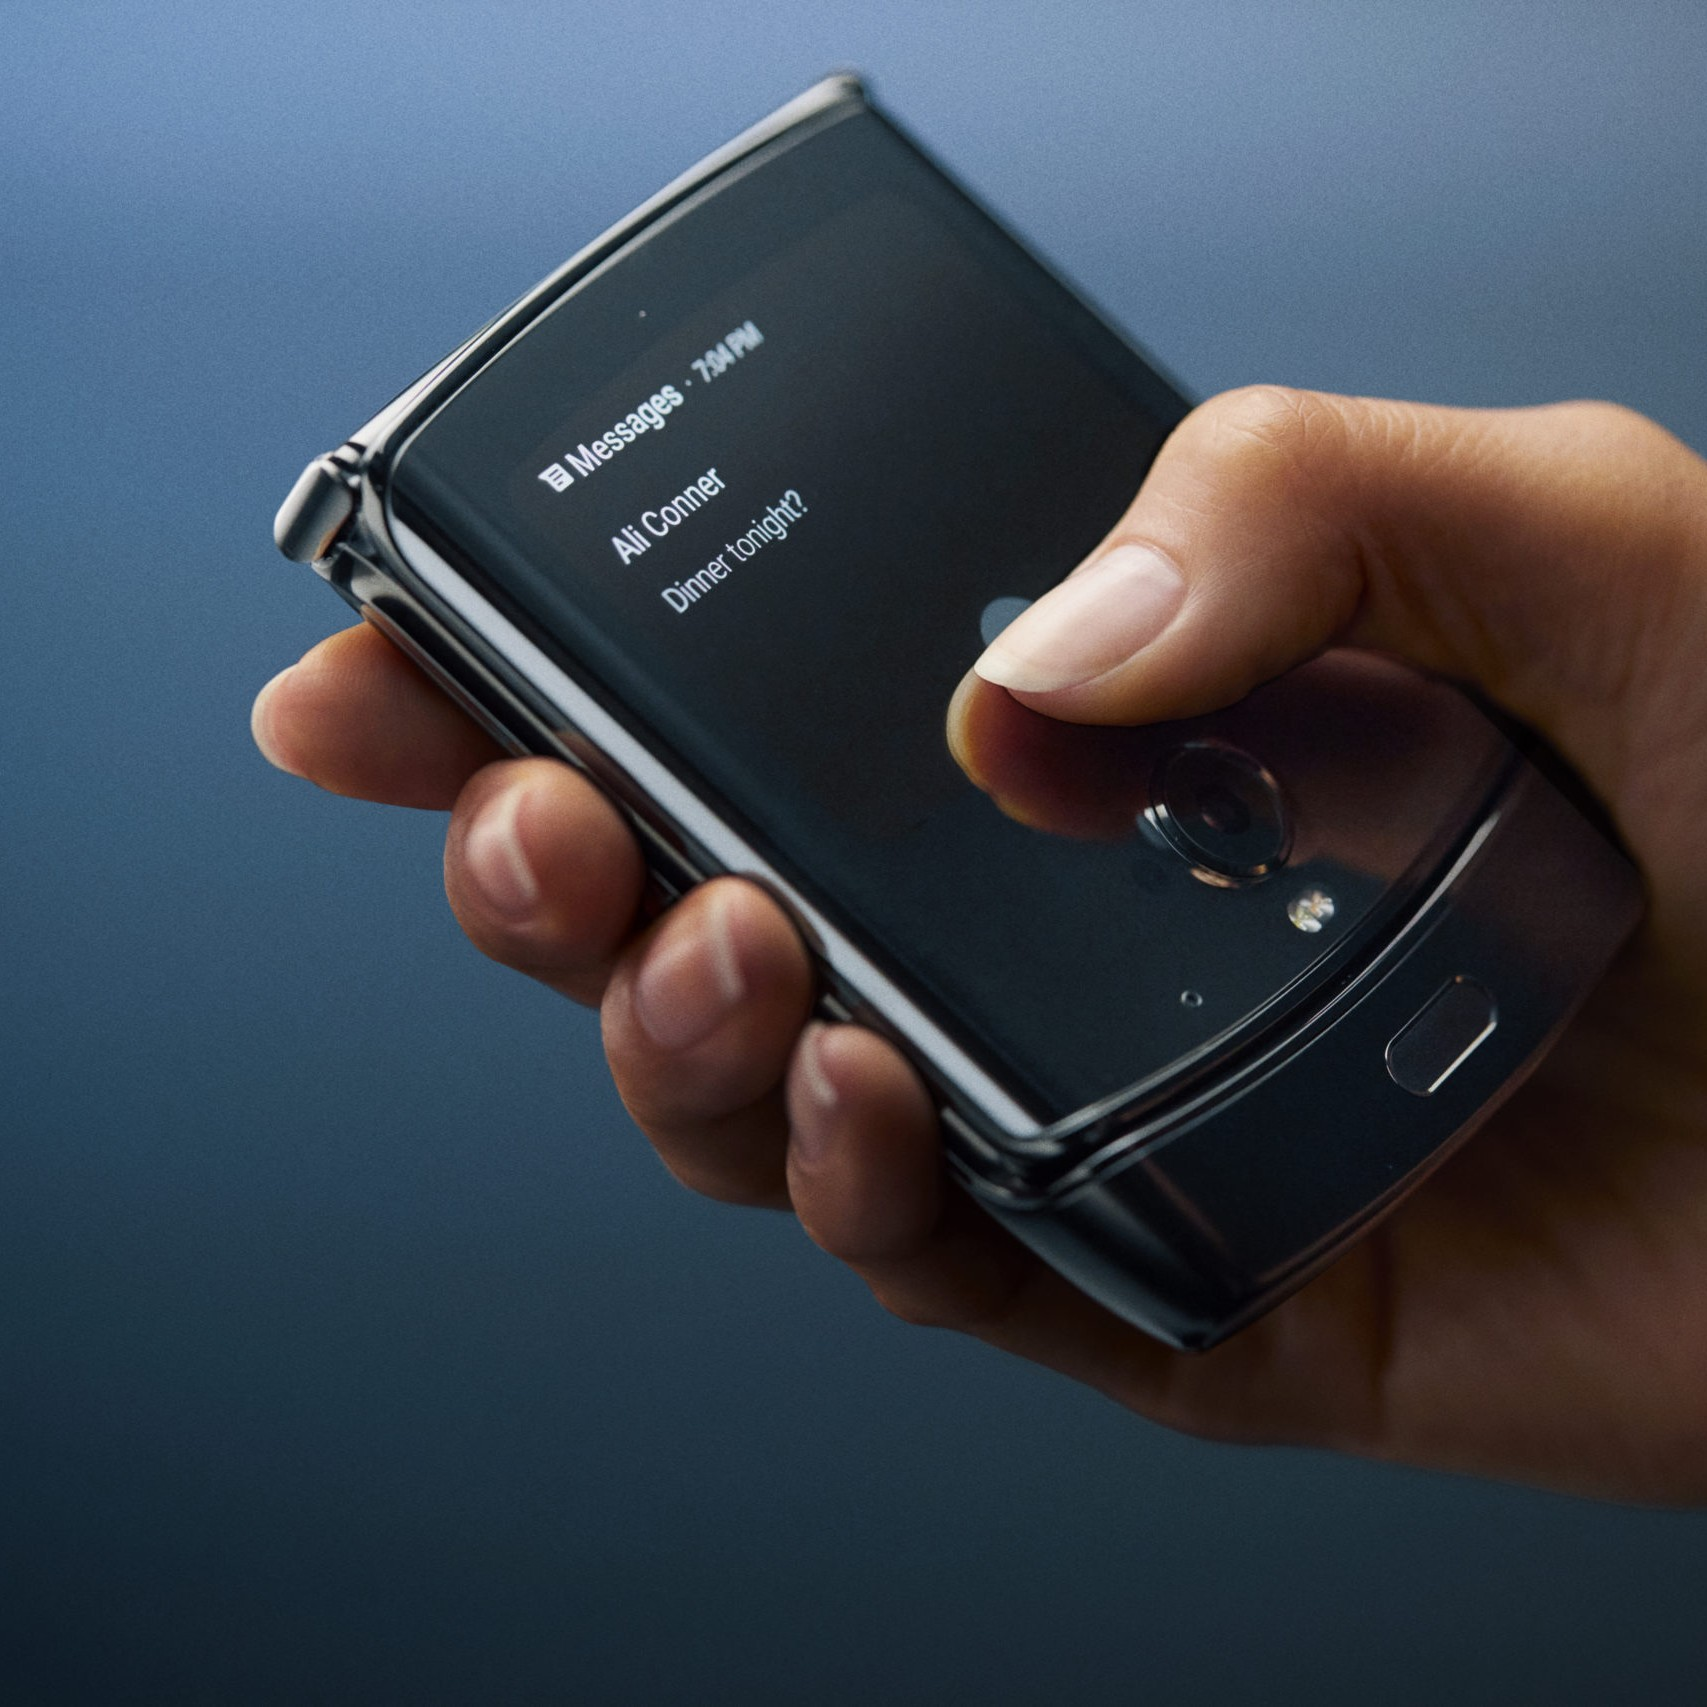 A hand holding Motorola Razr